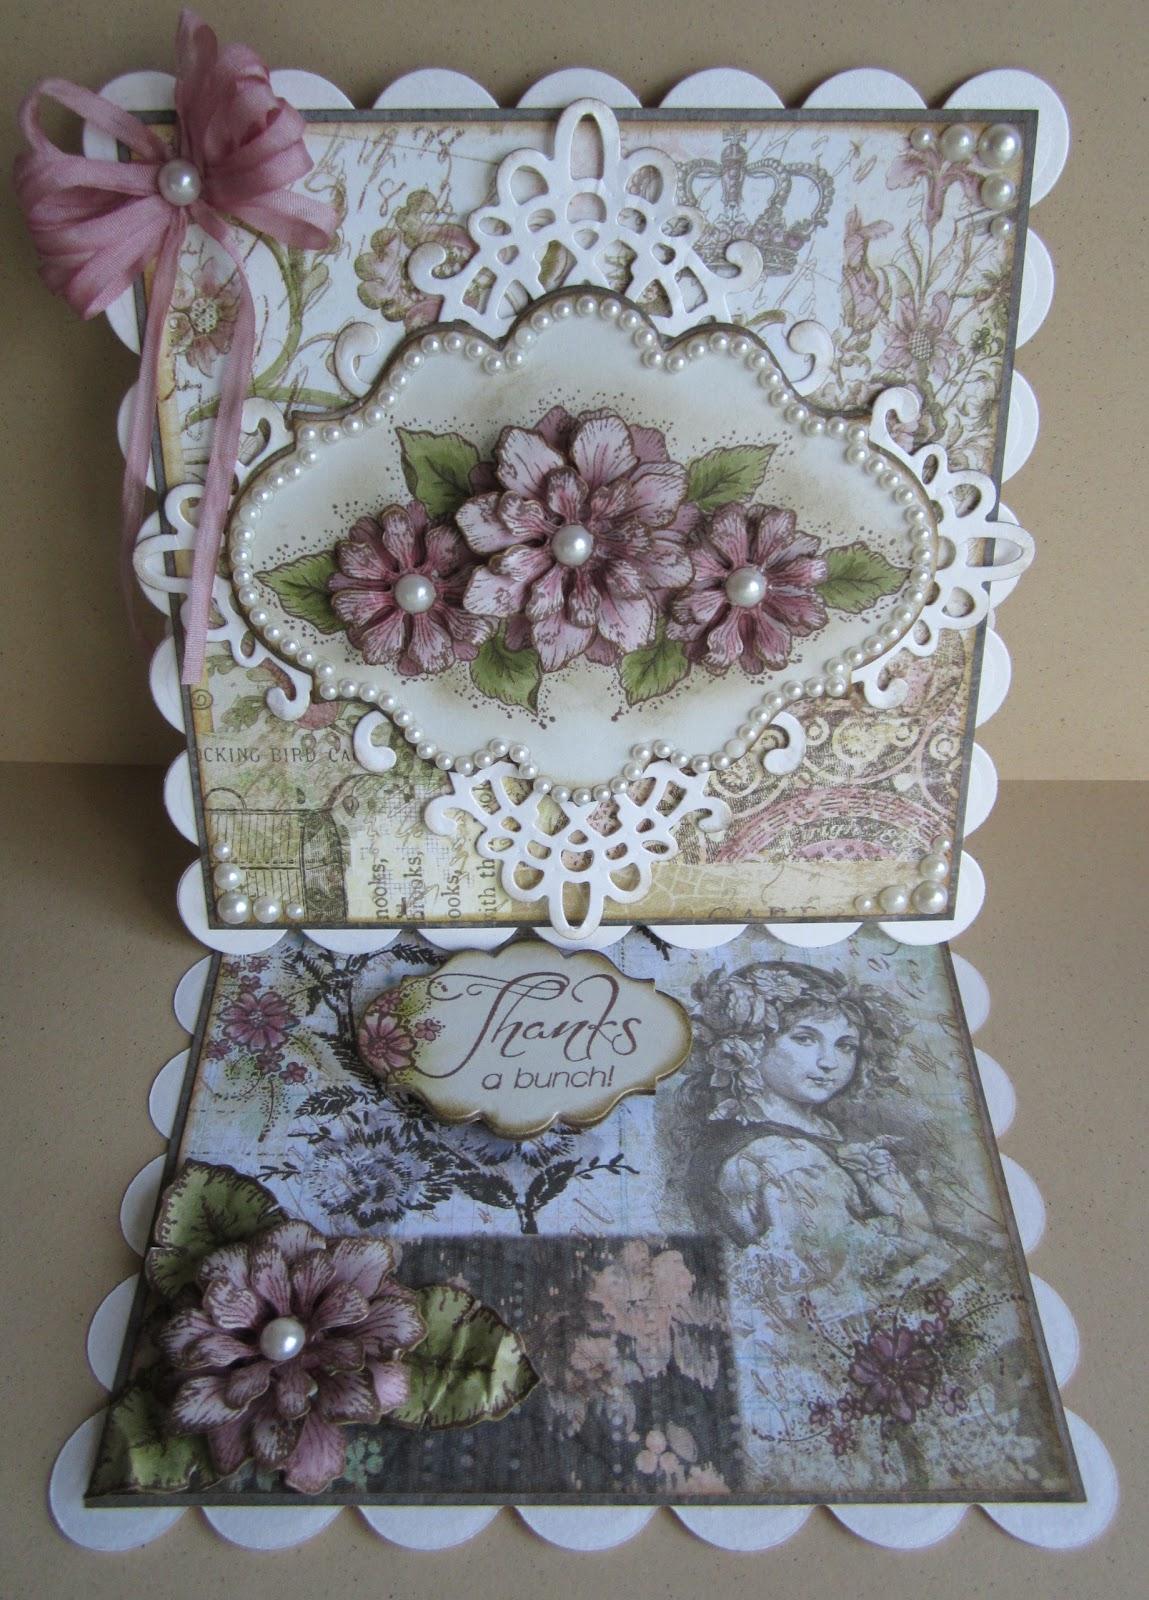 Designs by Marisa: Heartfelt Creations Thanks a Bunch ...